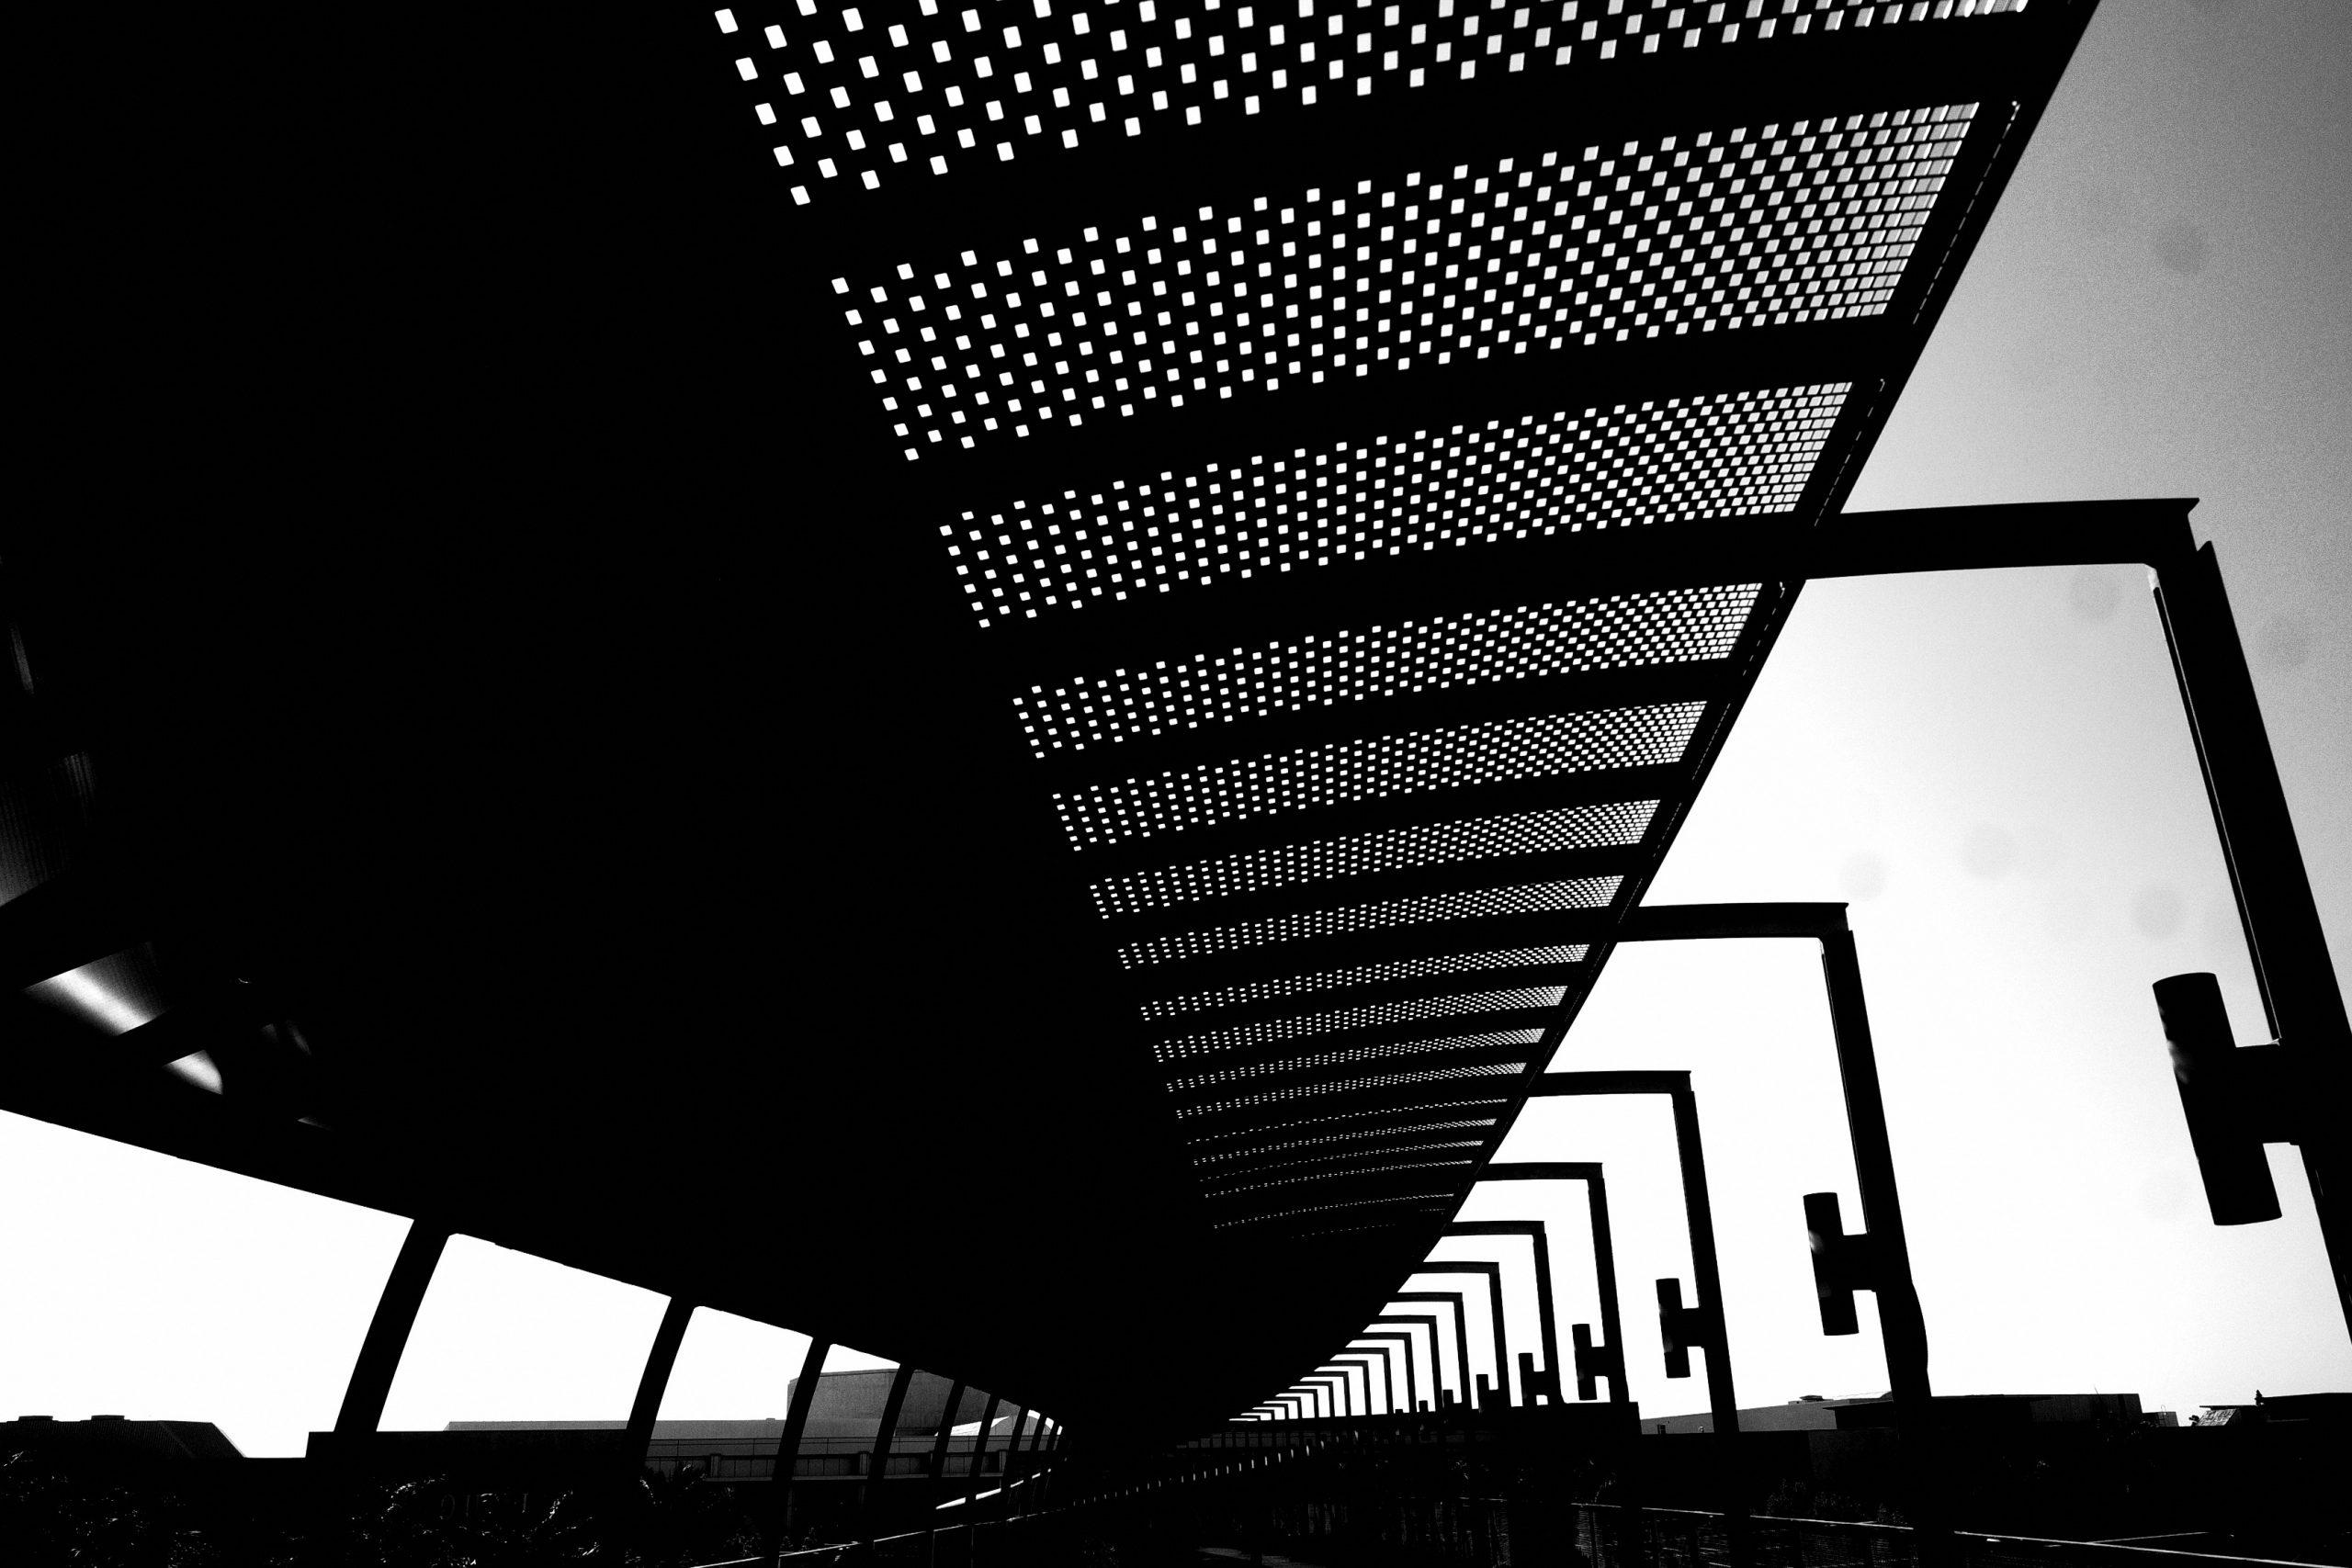 ceiling architecture movement